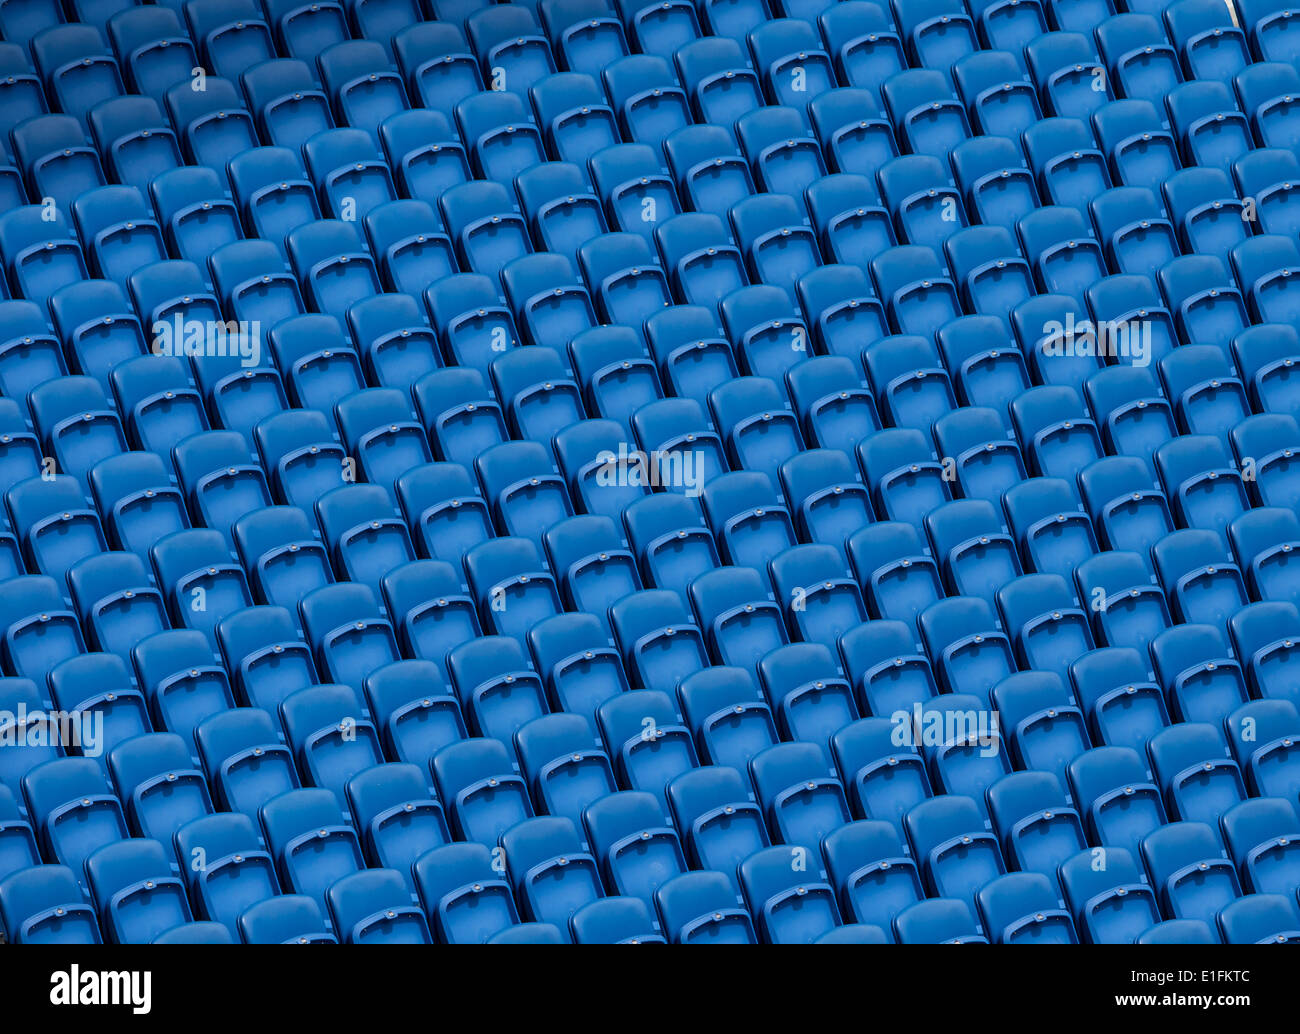 Football Stadium seating blue - Stock Image